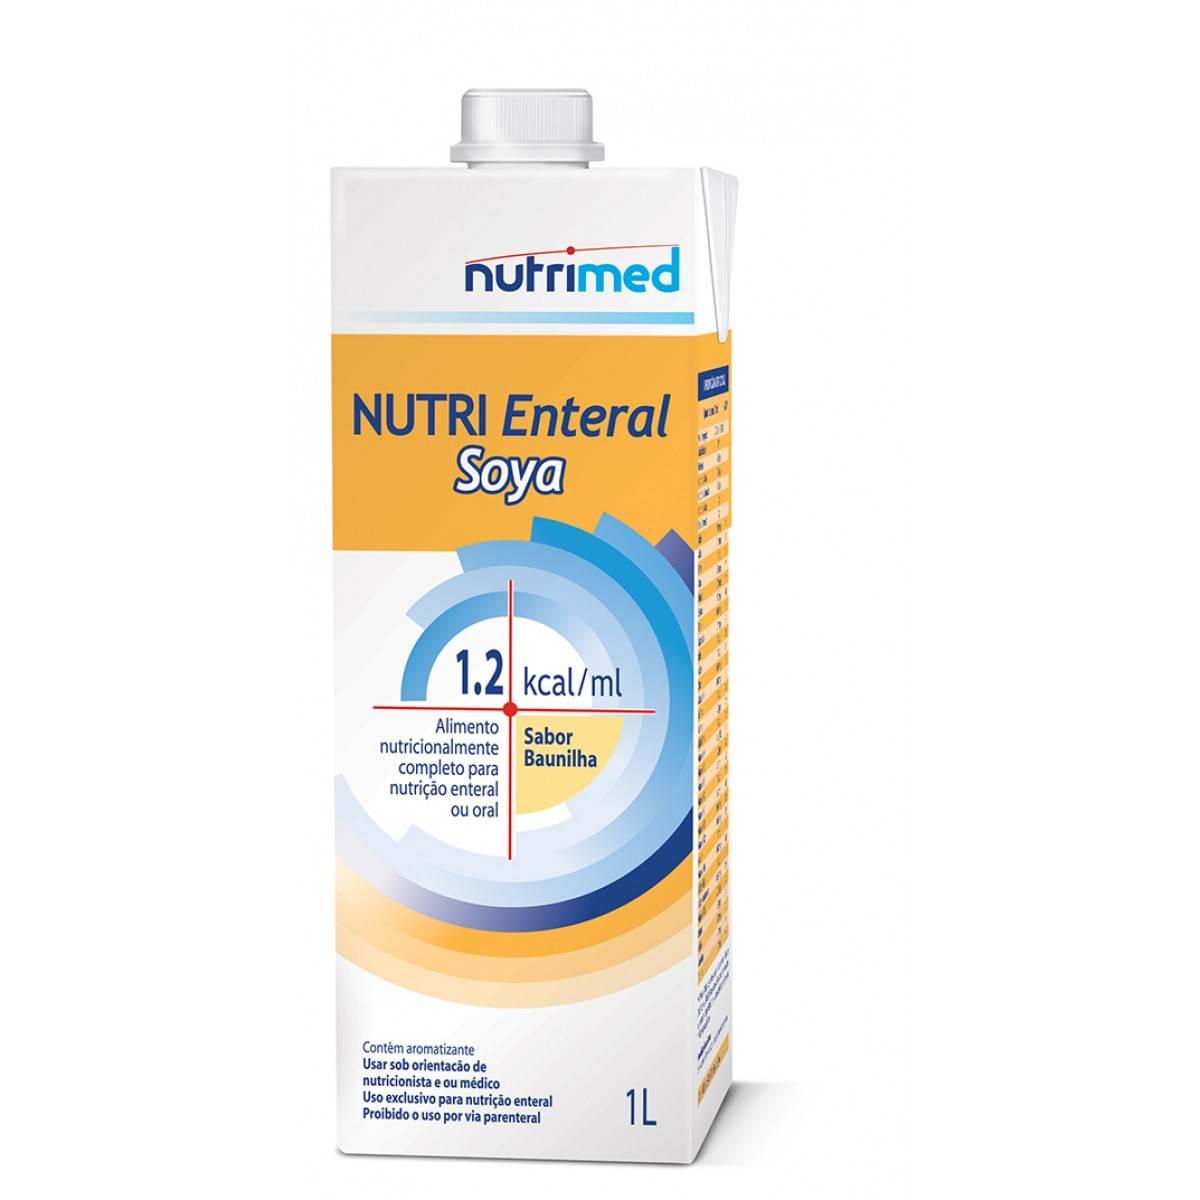 Nutri Enteral Soya Tetra Pak - 1 L - (DANONE)